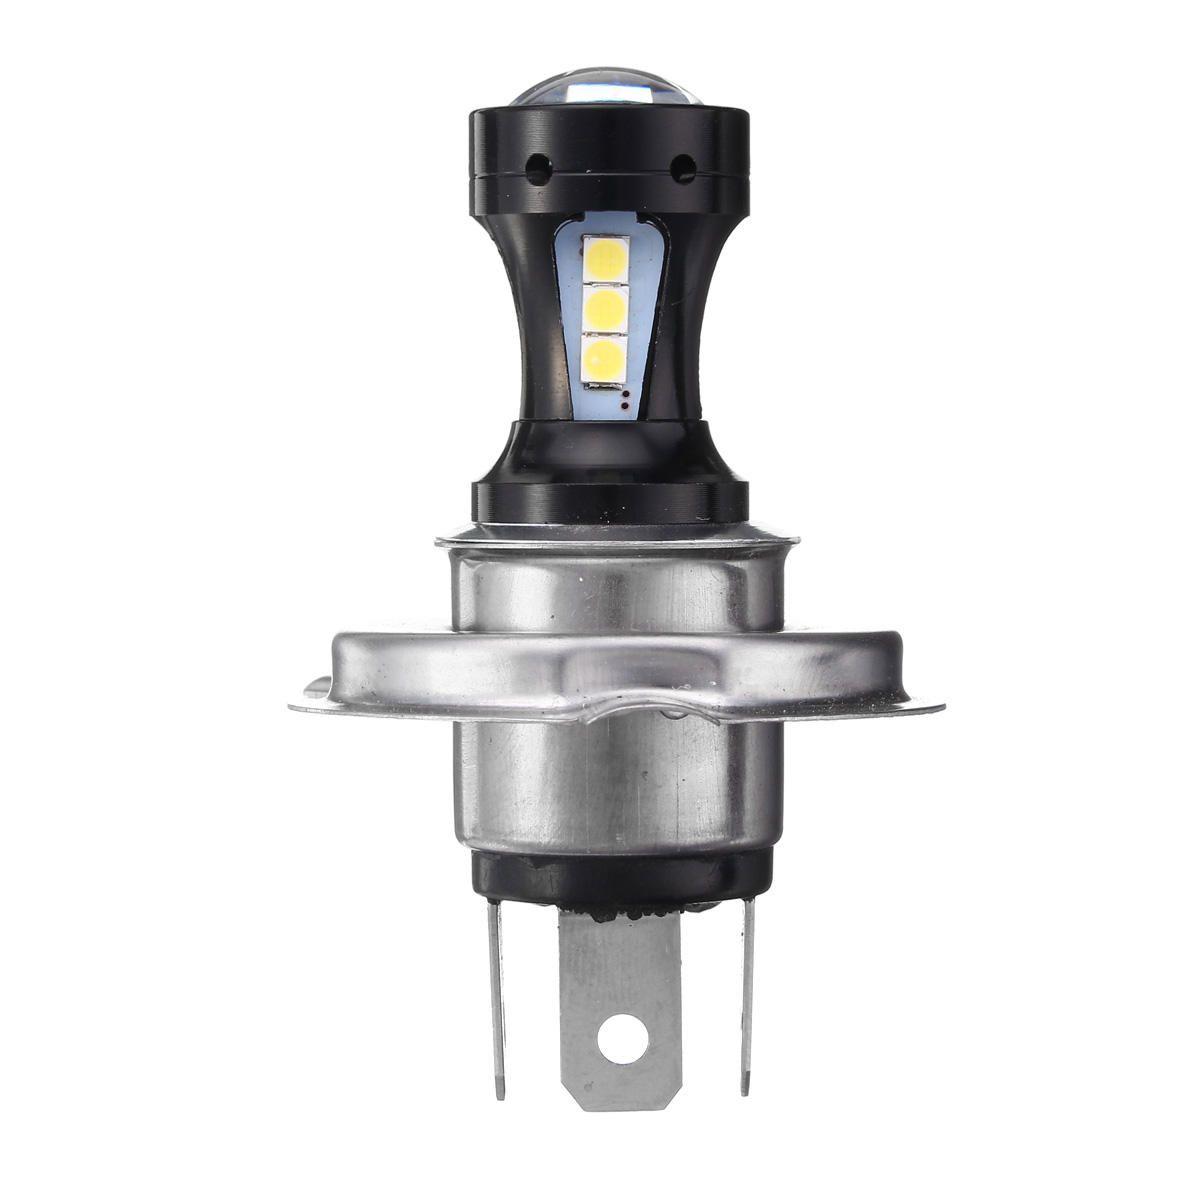 H4 18W 800LM Motorcycle LED Hi Lo Headlight Motor Bike Motor Light Bulb DC12 24V